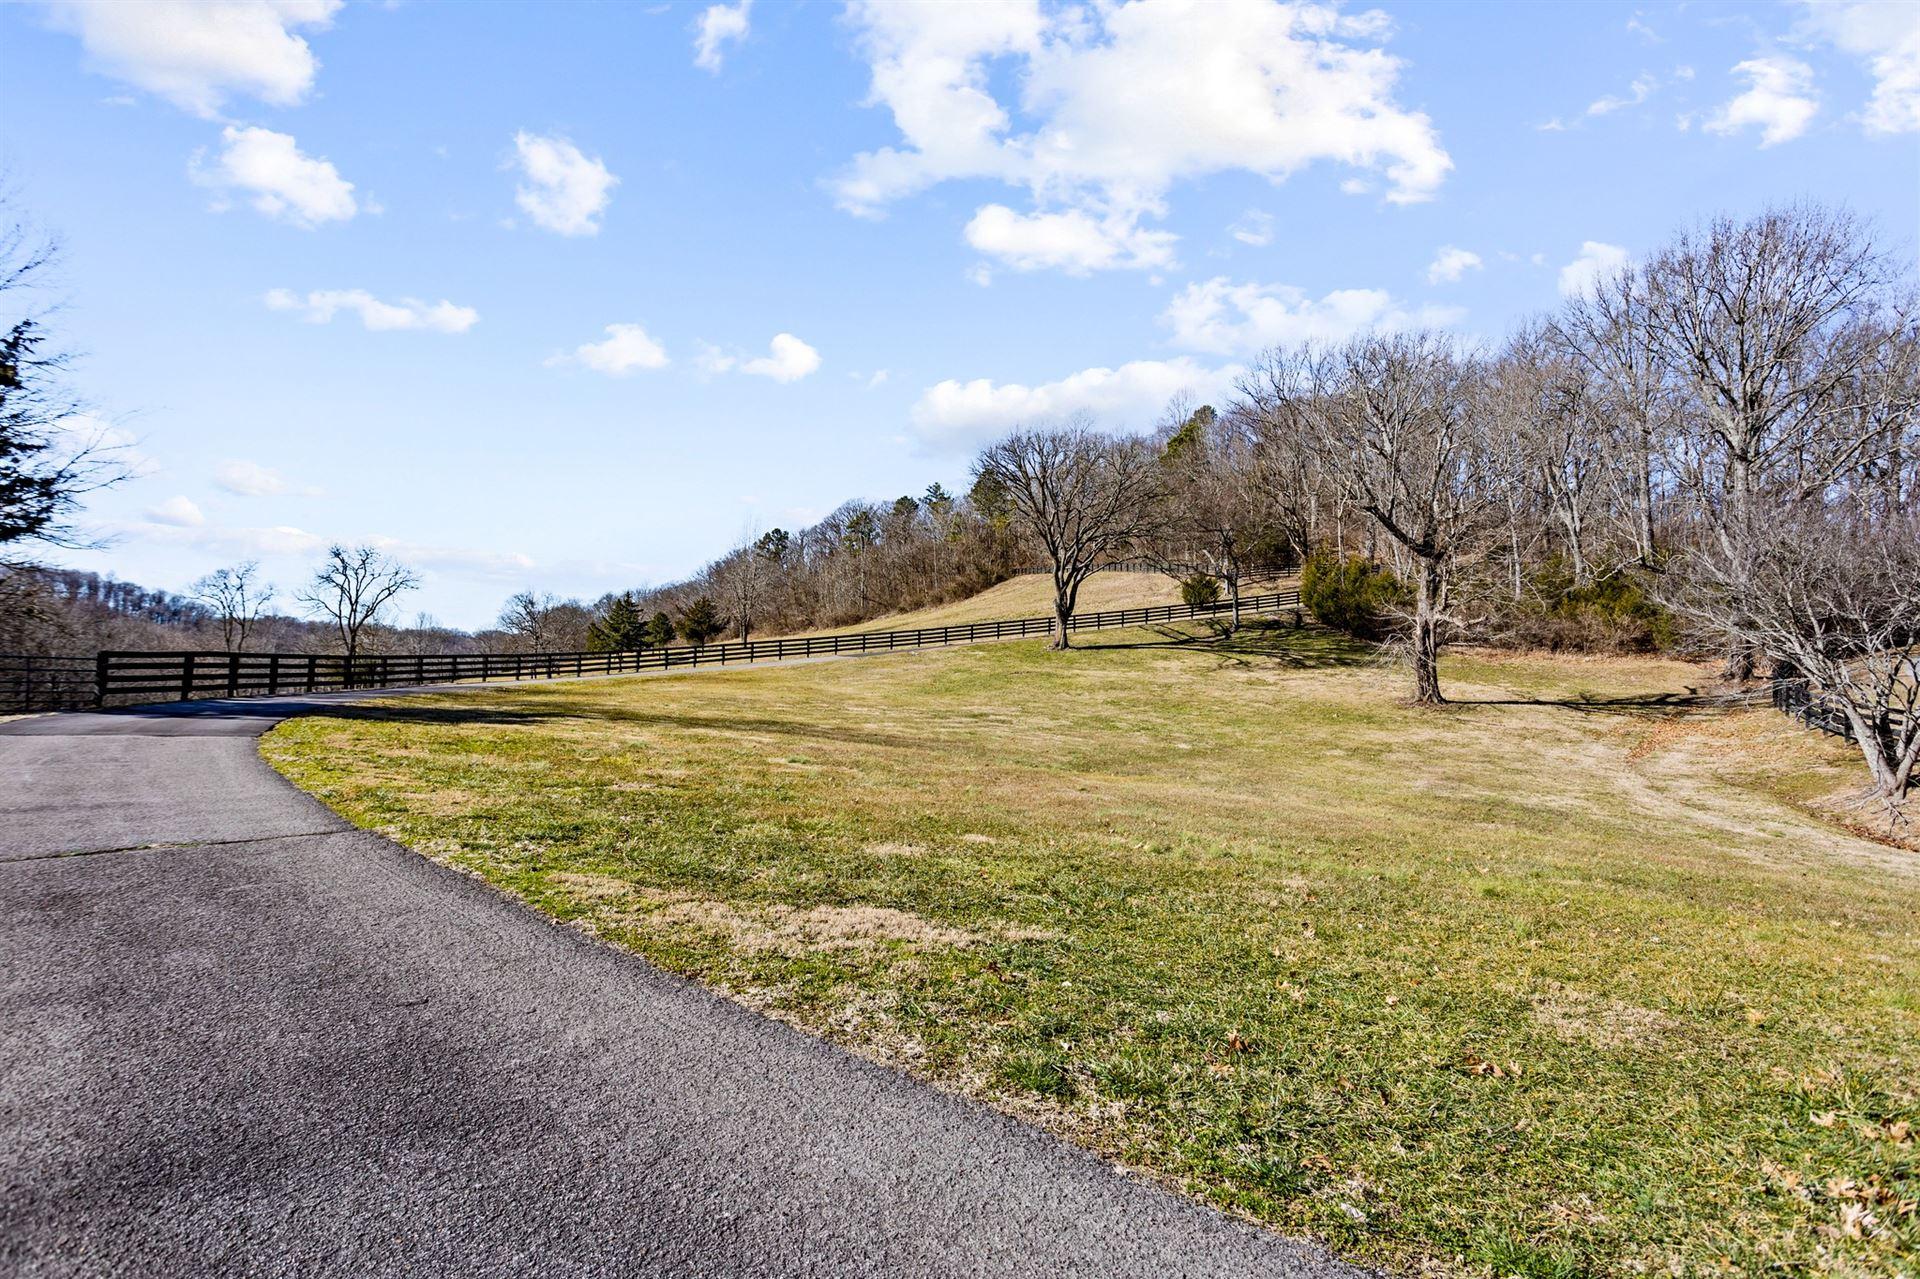 Photo of 1175 Hillview Ln, Franklin, TN 37064 (MLS # 2222011)